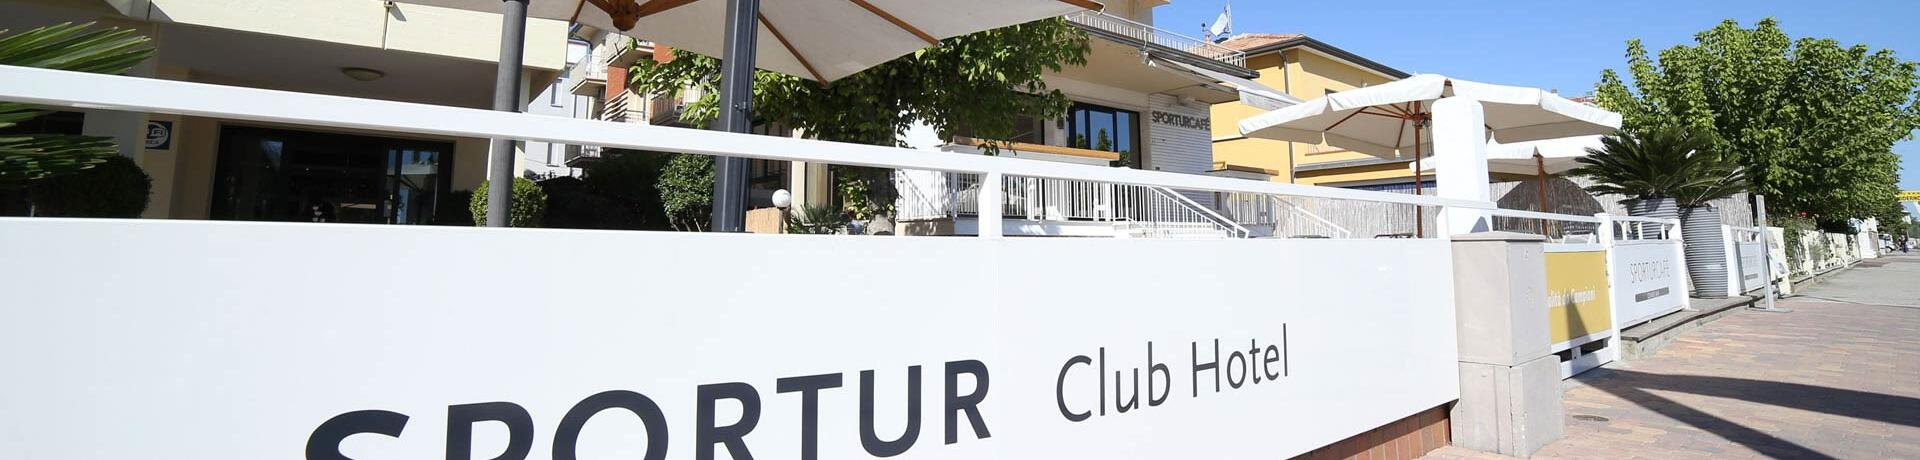 granfondoviadelsale en sportur-club-hotel 012